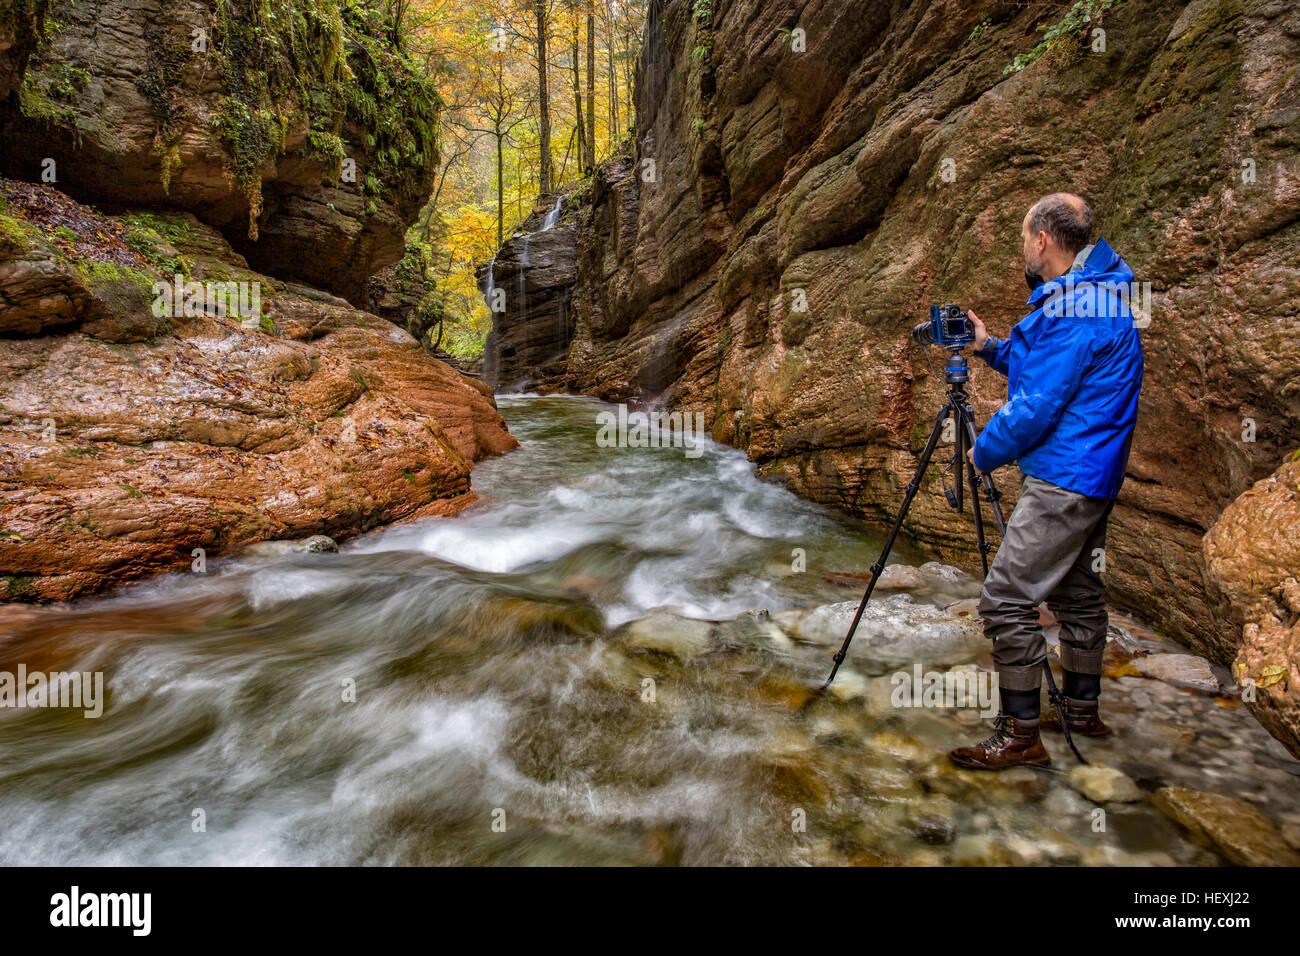 Austria, Tennegau, Photographer standing at Taugl river Stock Photo